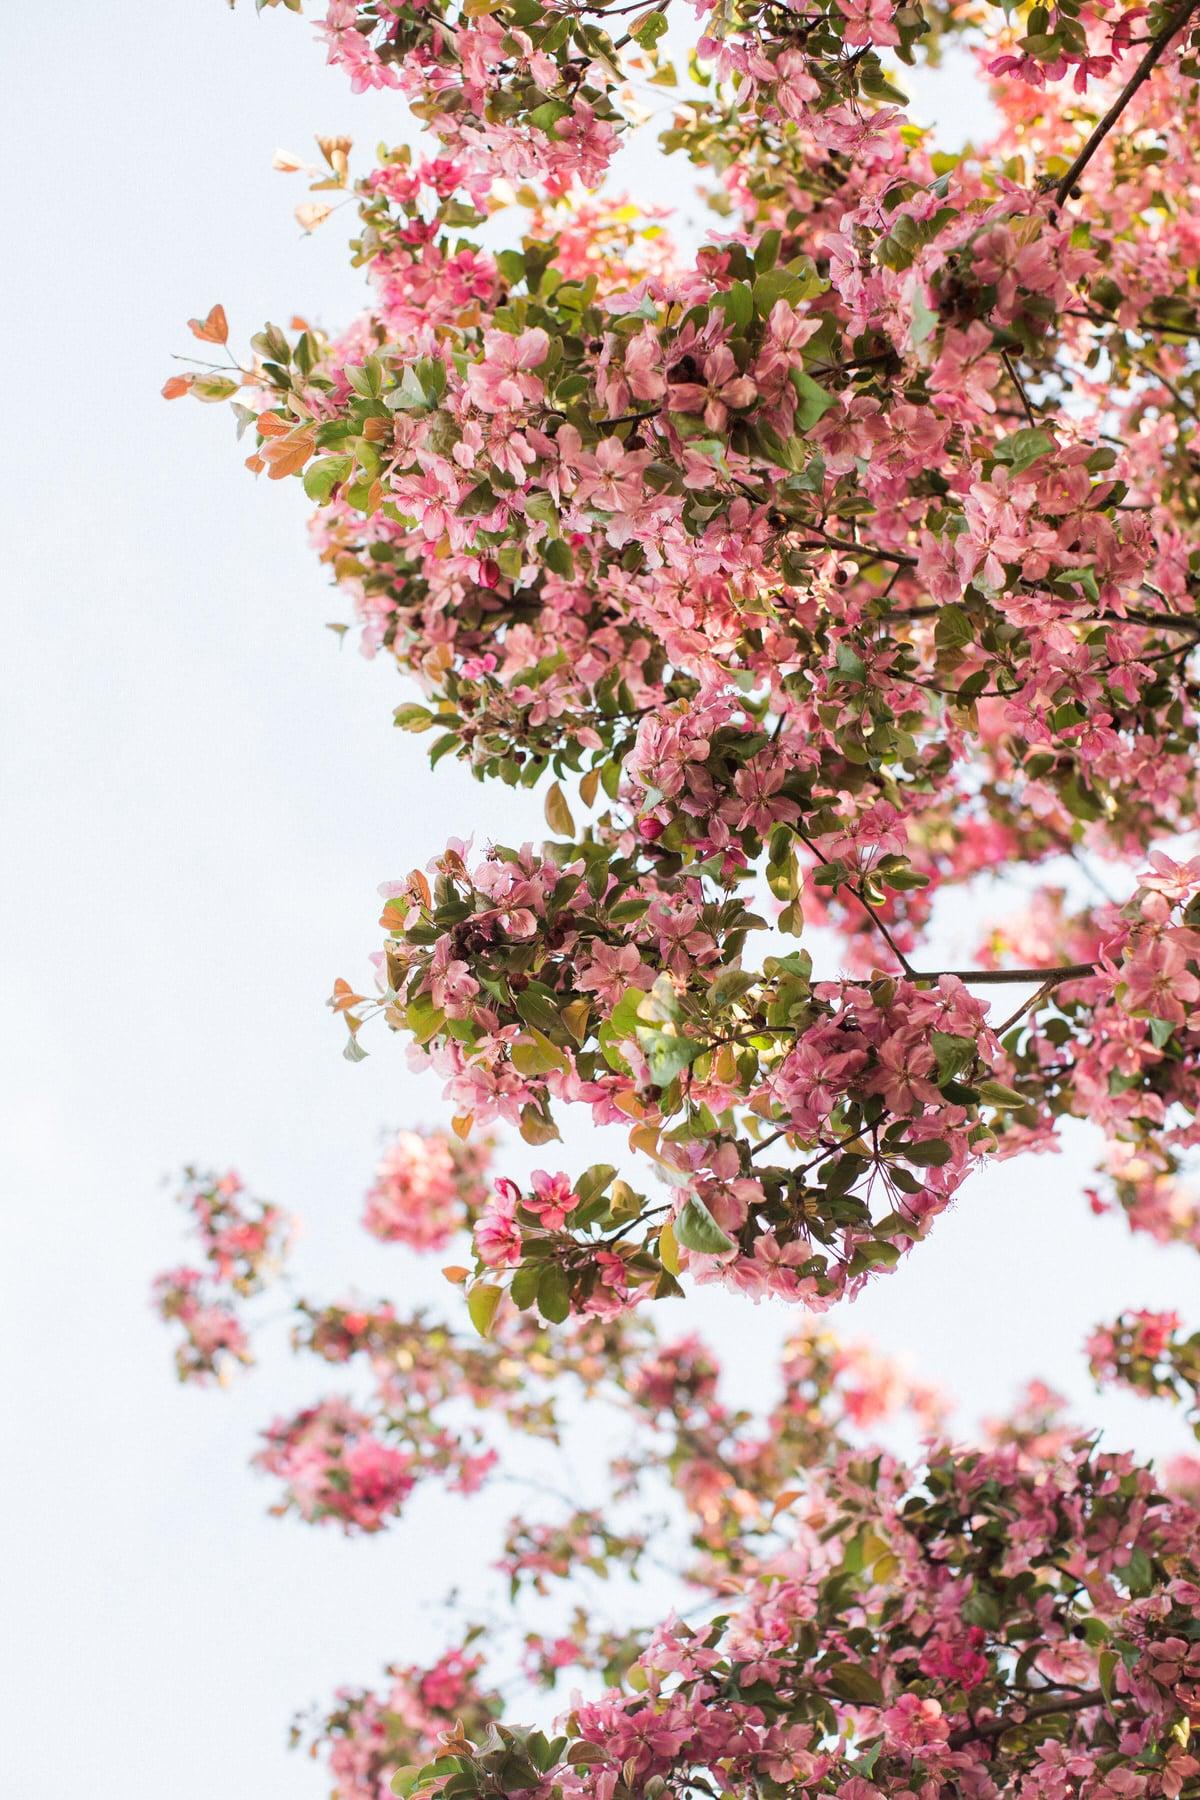 spring-bloom-Wisconsin-fine-art-photography-by-Studio-L-photographer-Laura-Schneider-_5583